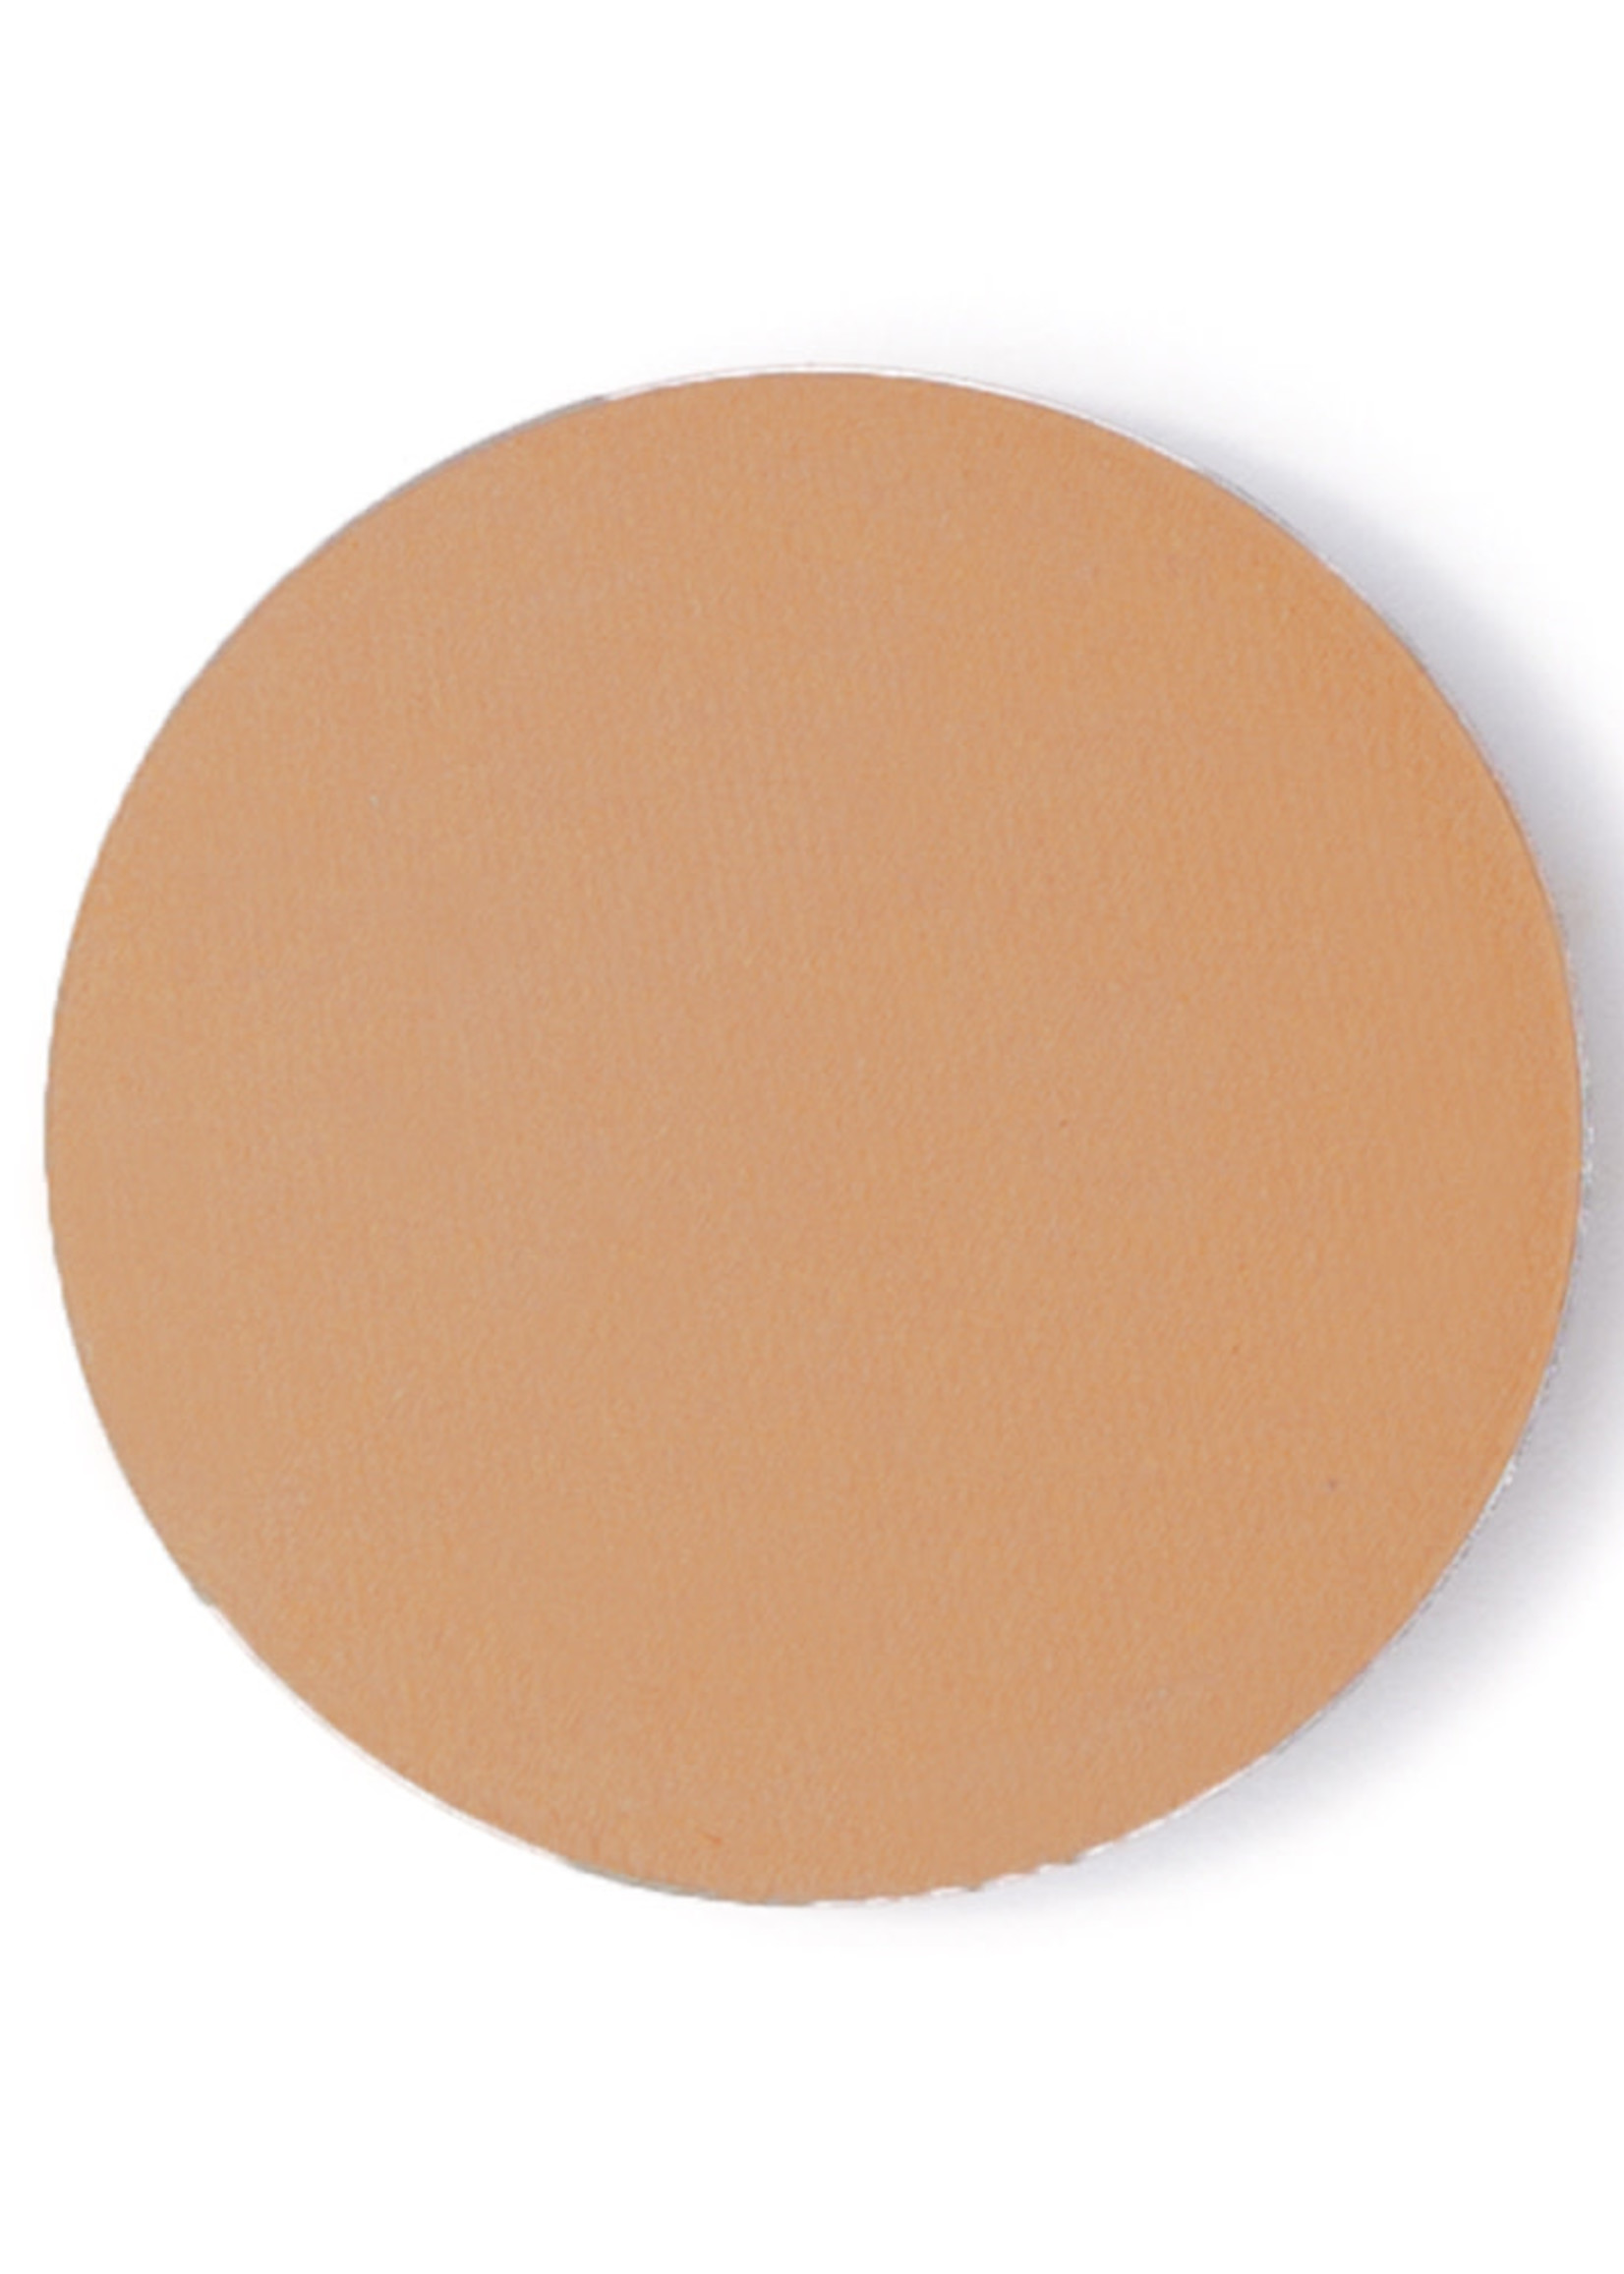 Elate Pressed Cheek Colour Refill: Sunbeam